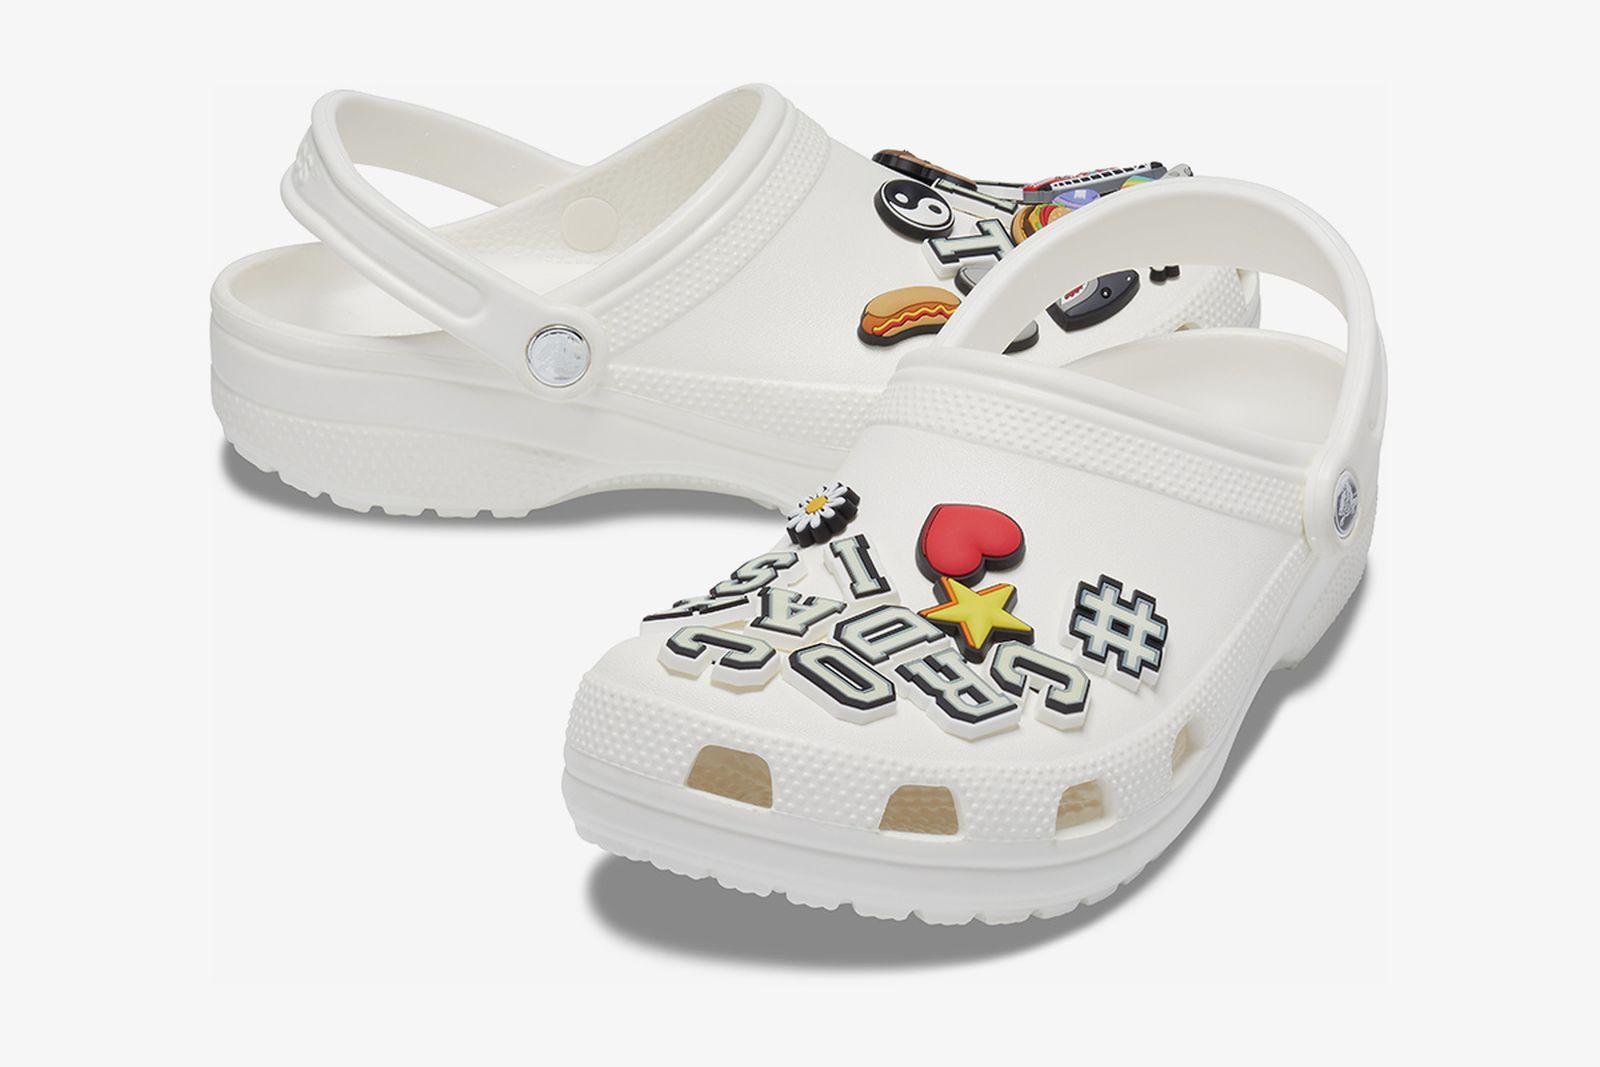 pizzaslime-crocs-classic-clog-release-date-price-03